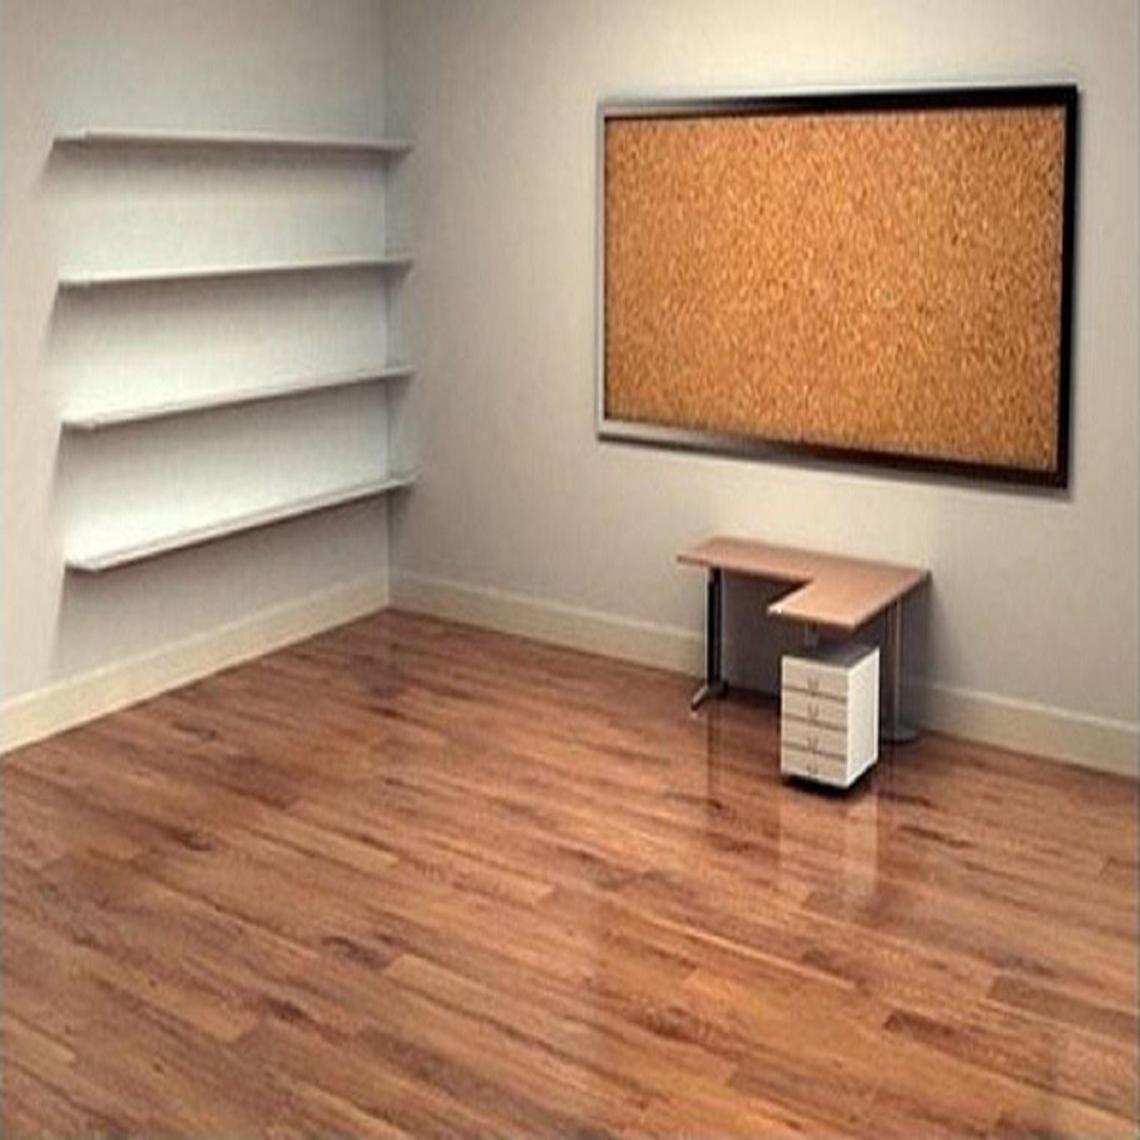 Escritorio Wallpaper Shelves 3d Desktop Wallpaper Desktop Wallpaper Organizer